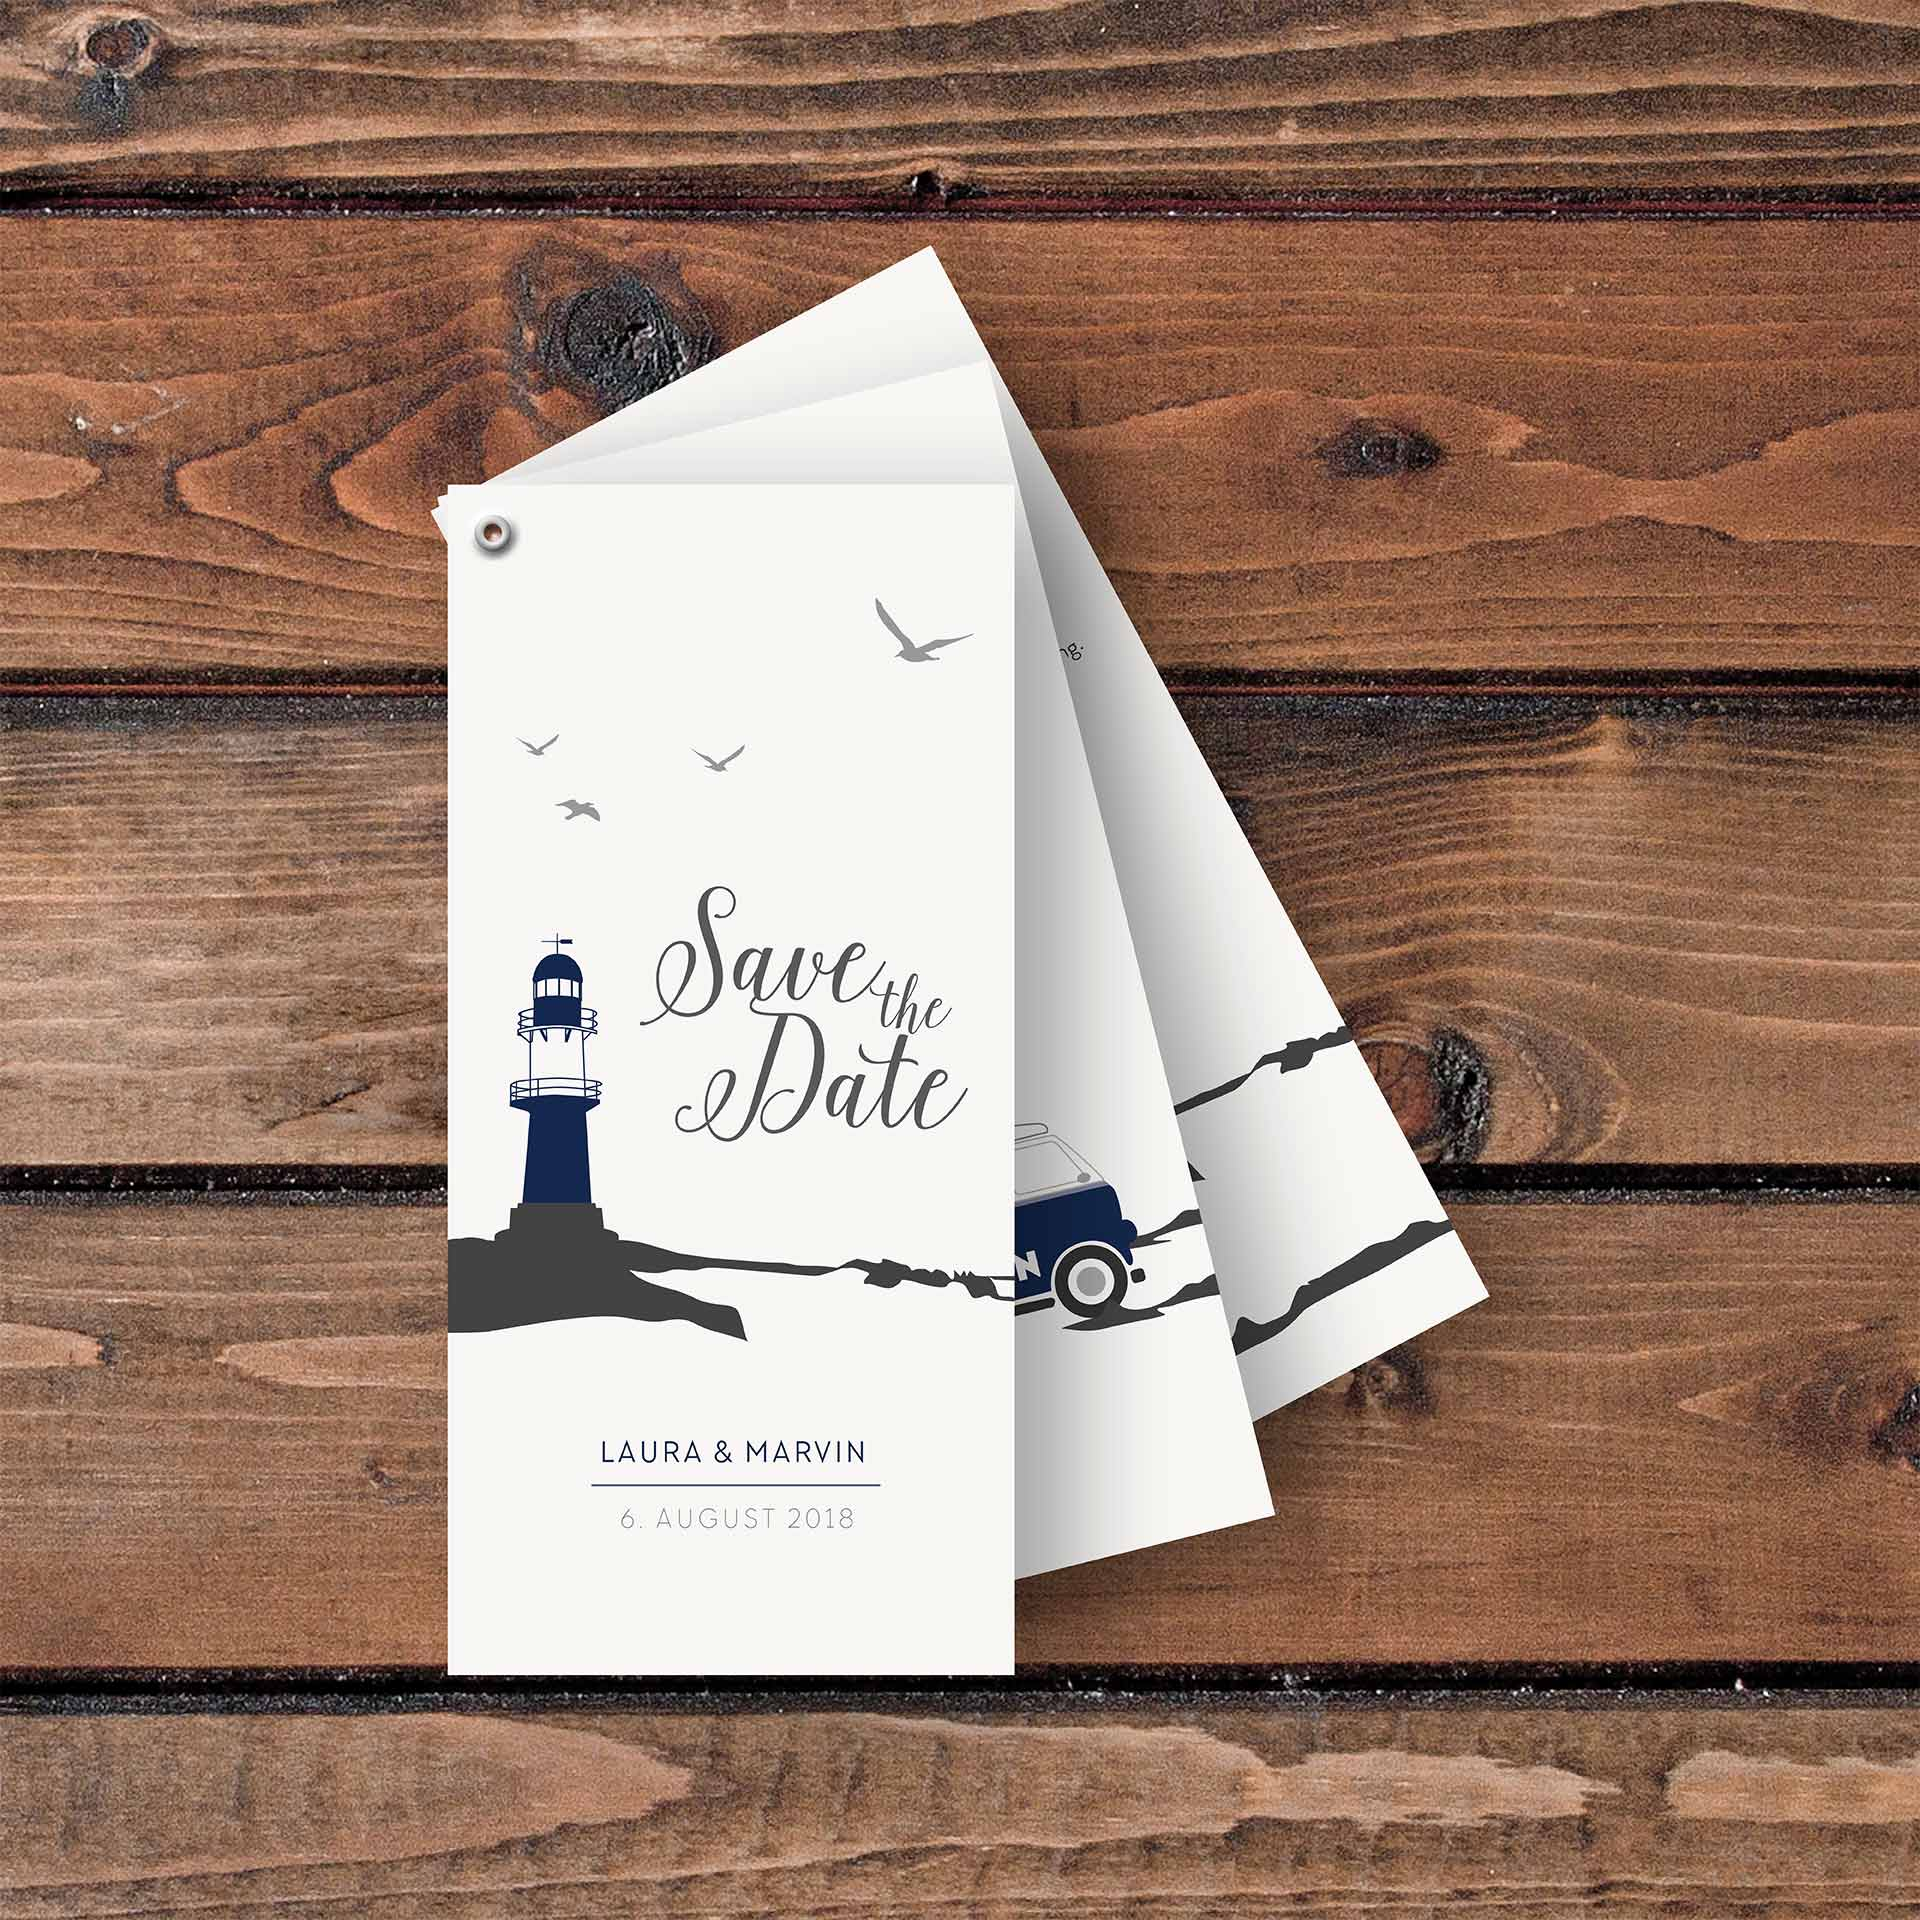 Einladungskarten Faecherkarten Meerblick